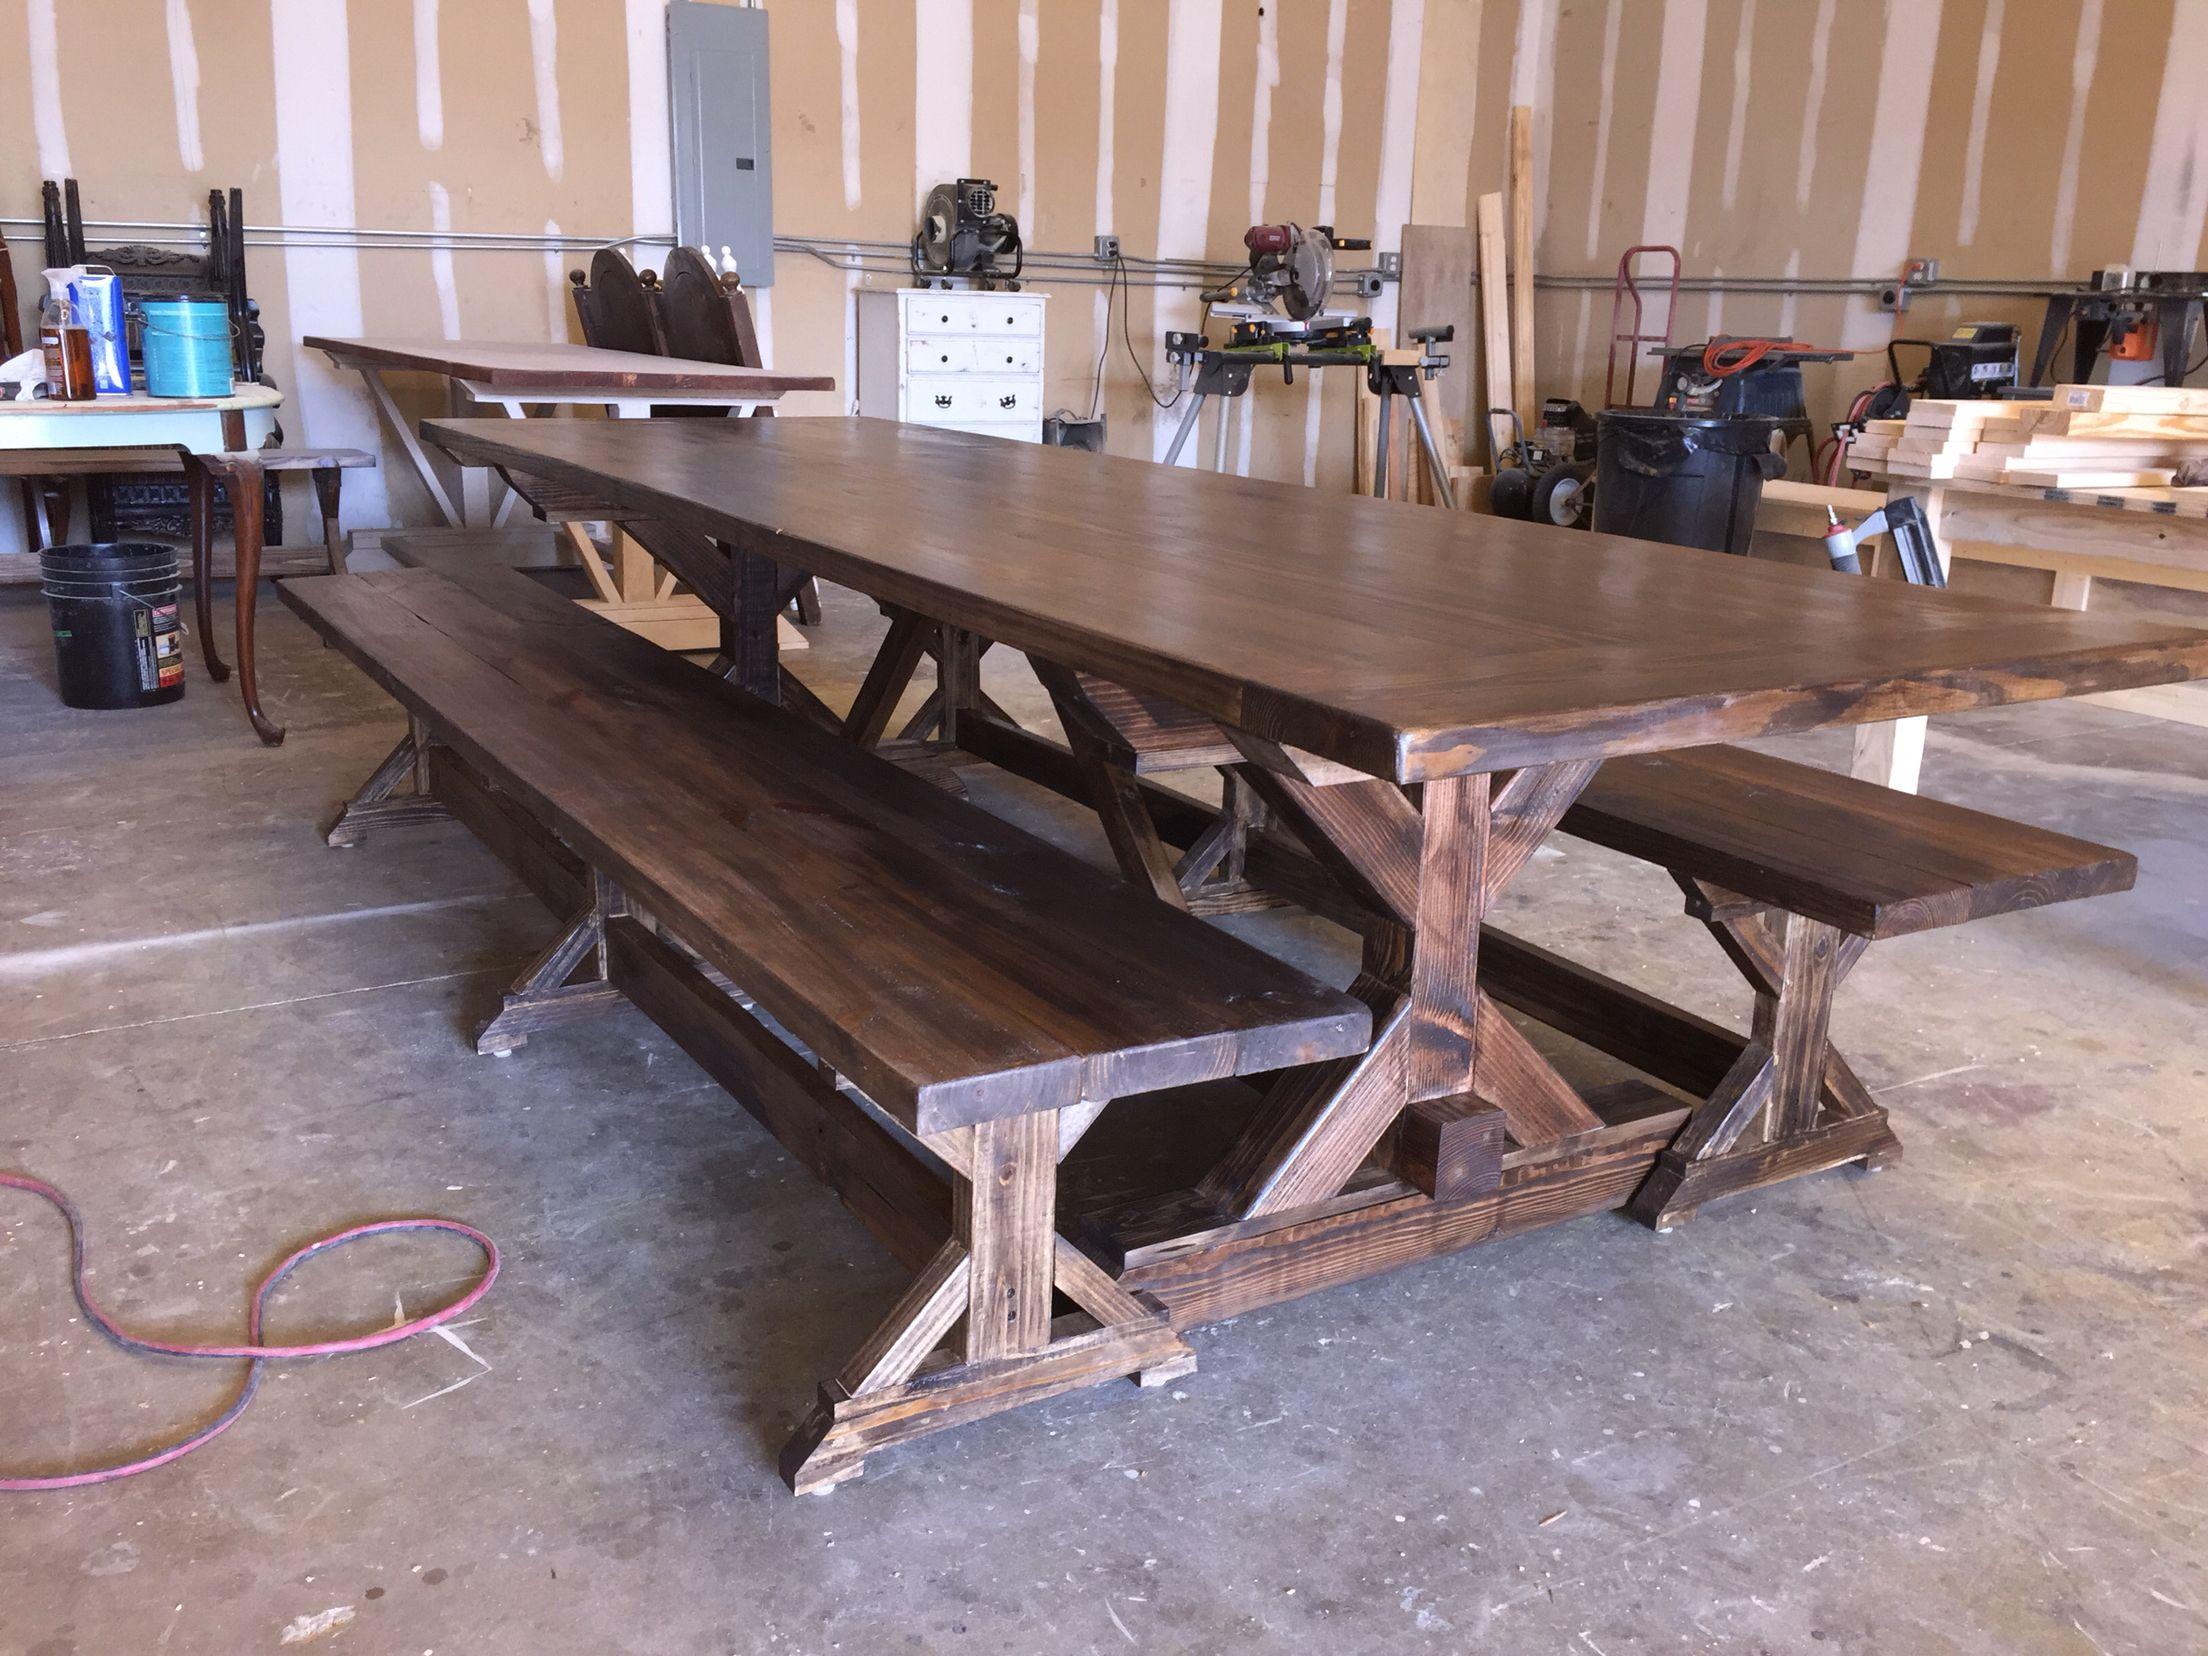 4x4 X Base Farmhouse Table 8 Ft Dining Table Dining Room Table